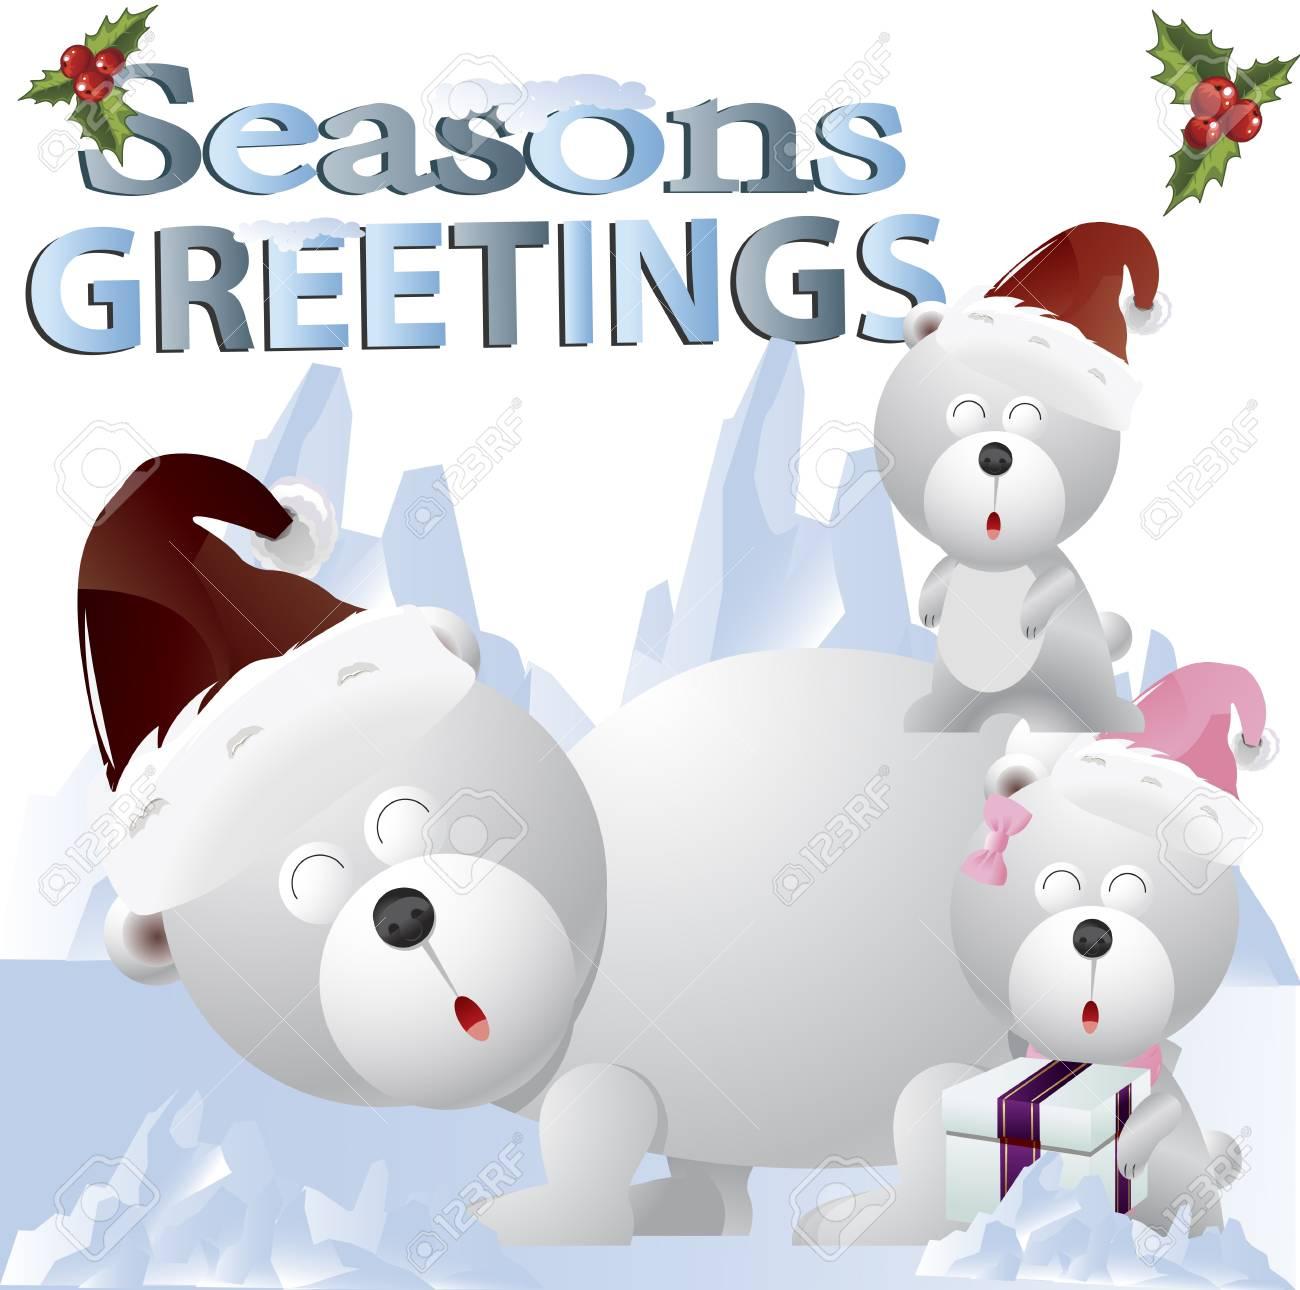 Clip art image of a Christmas bears on snow Stock Photo - 15616909